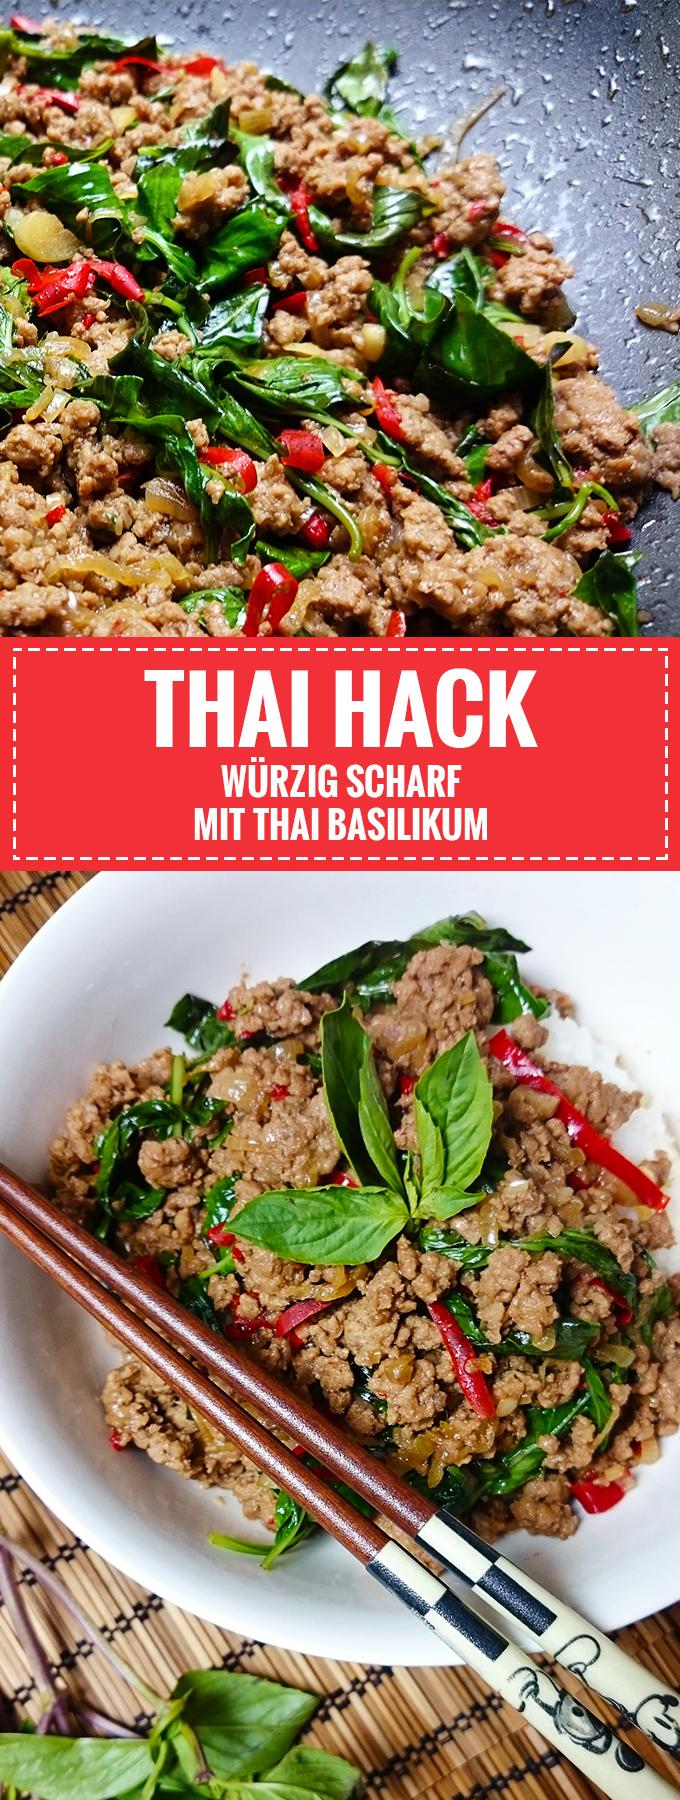 Würzig und Scharf // Thai-Hackfleisch mit Basilikum // Pad Krapao // Knabberkult.de